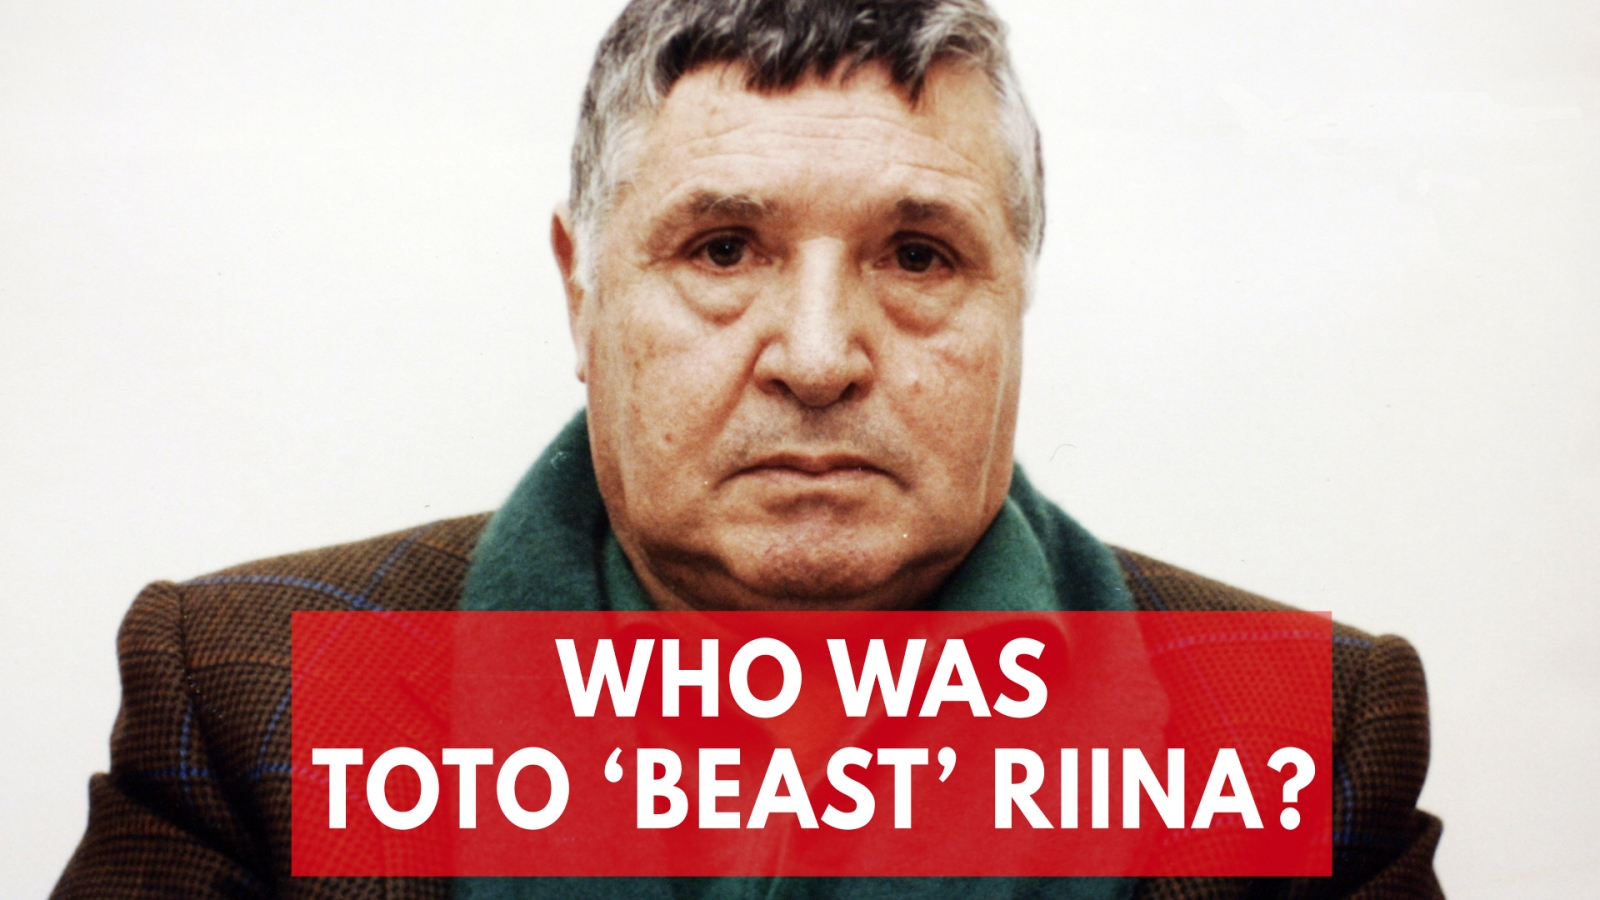 who-was-toto-beast-riina-italy-mafia-boss-of-bosses-dies-at-87